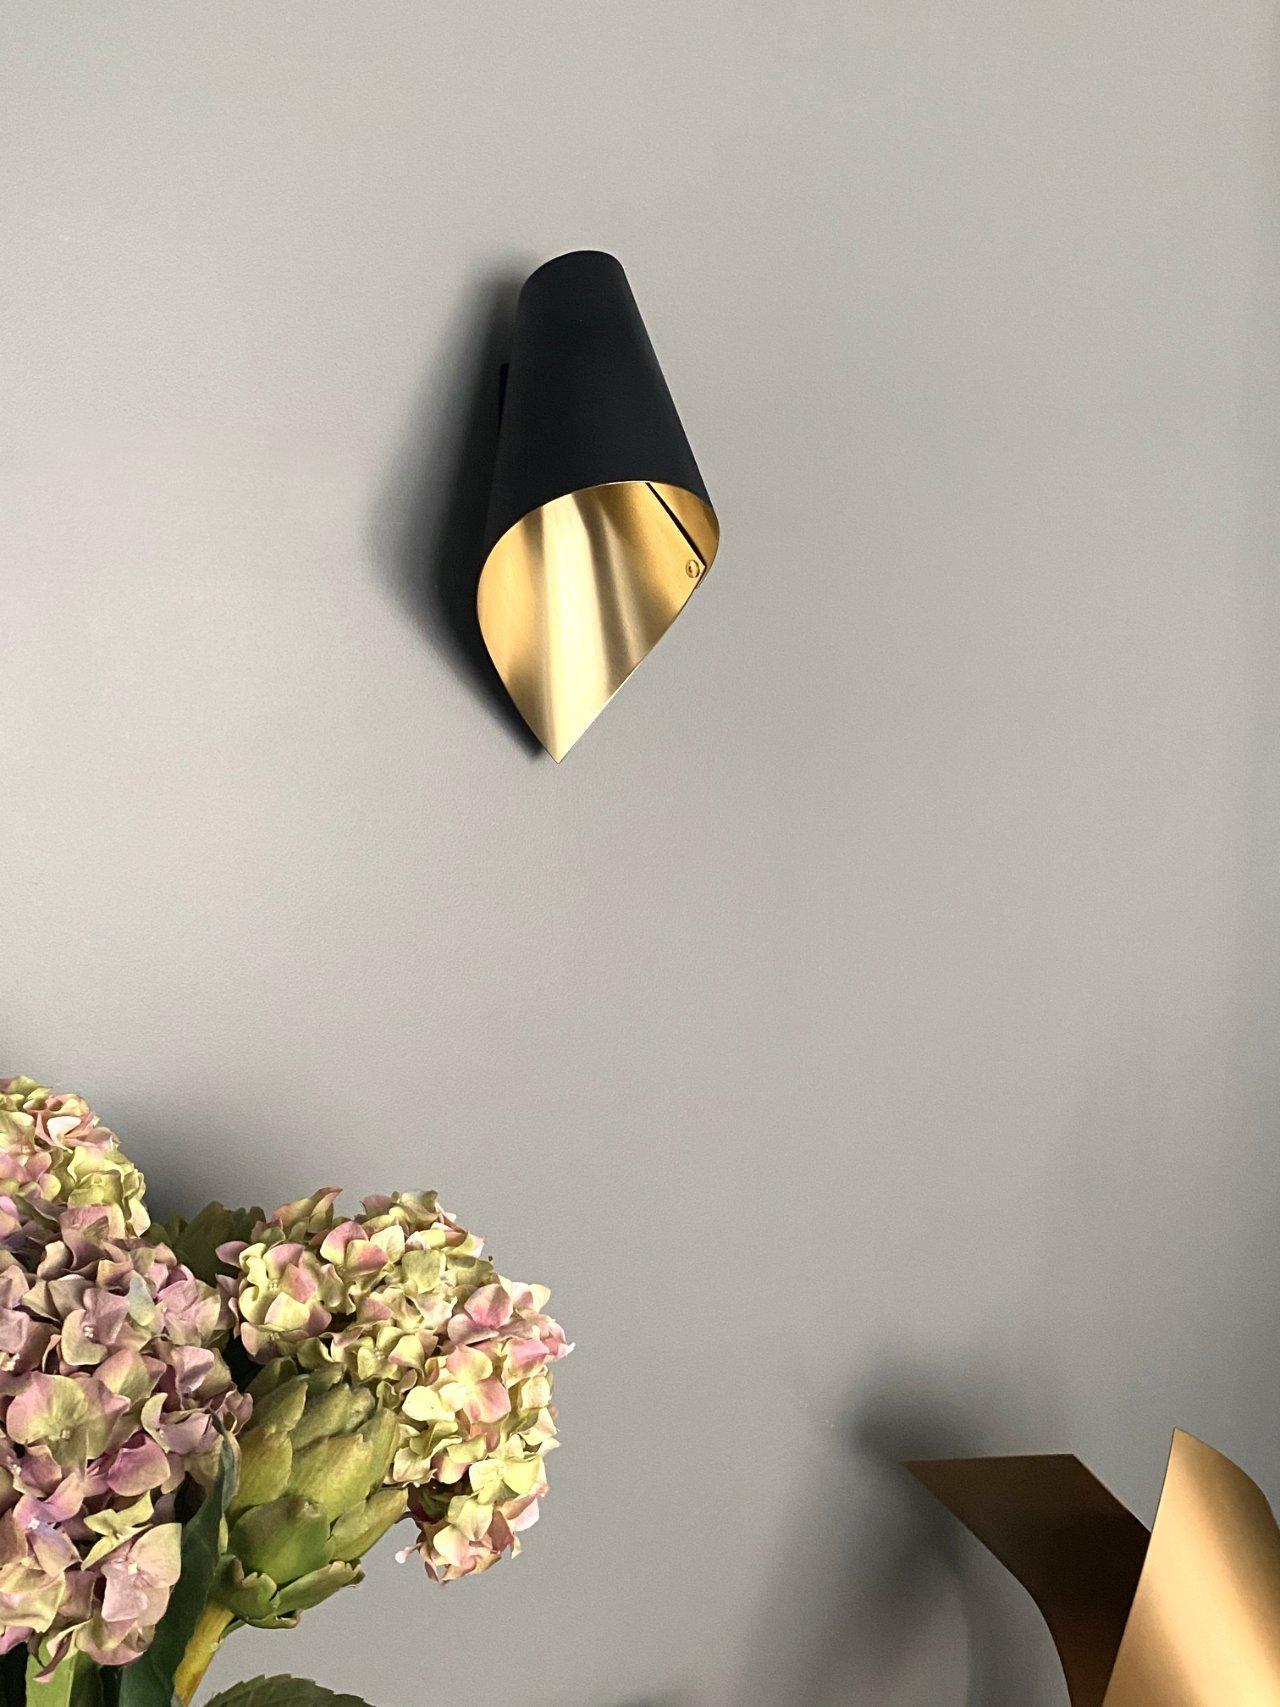 ARCFORM Wall Light in Brushed Brass & Matte Black